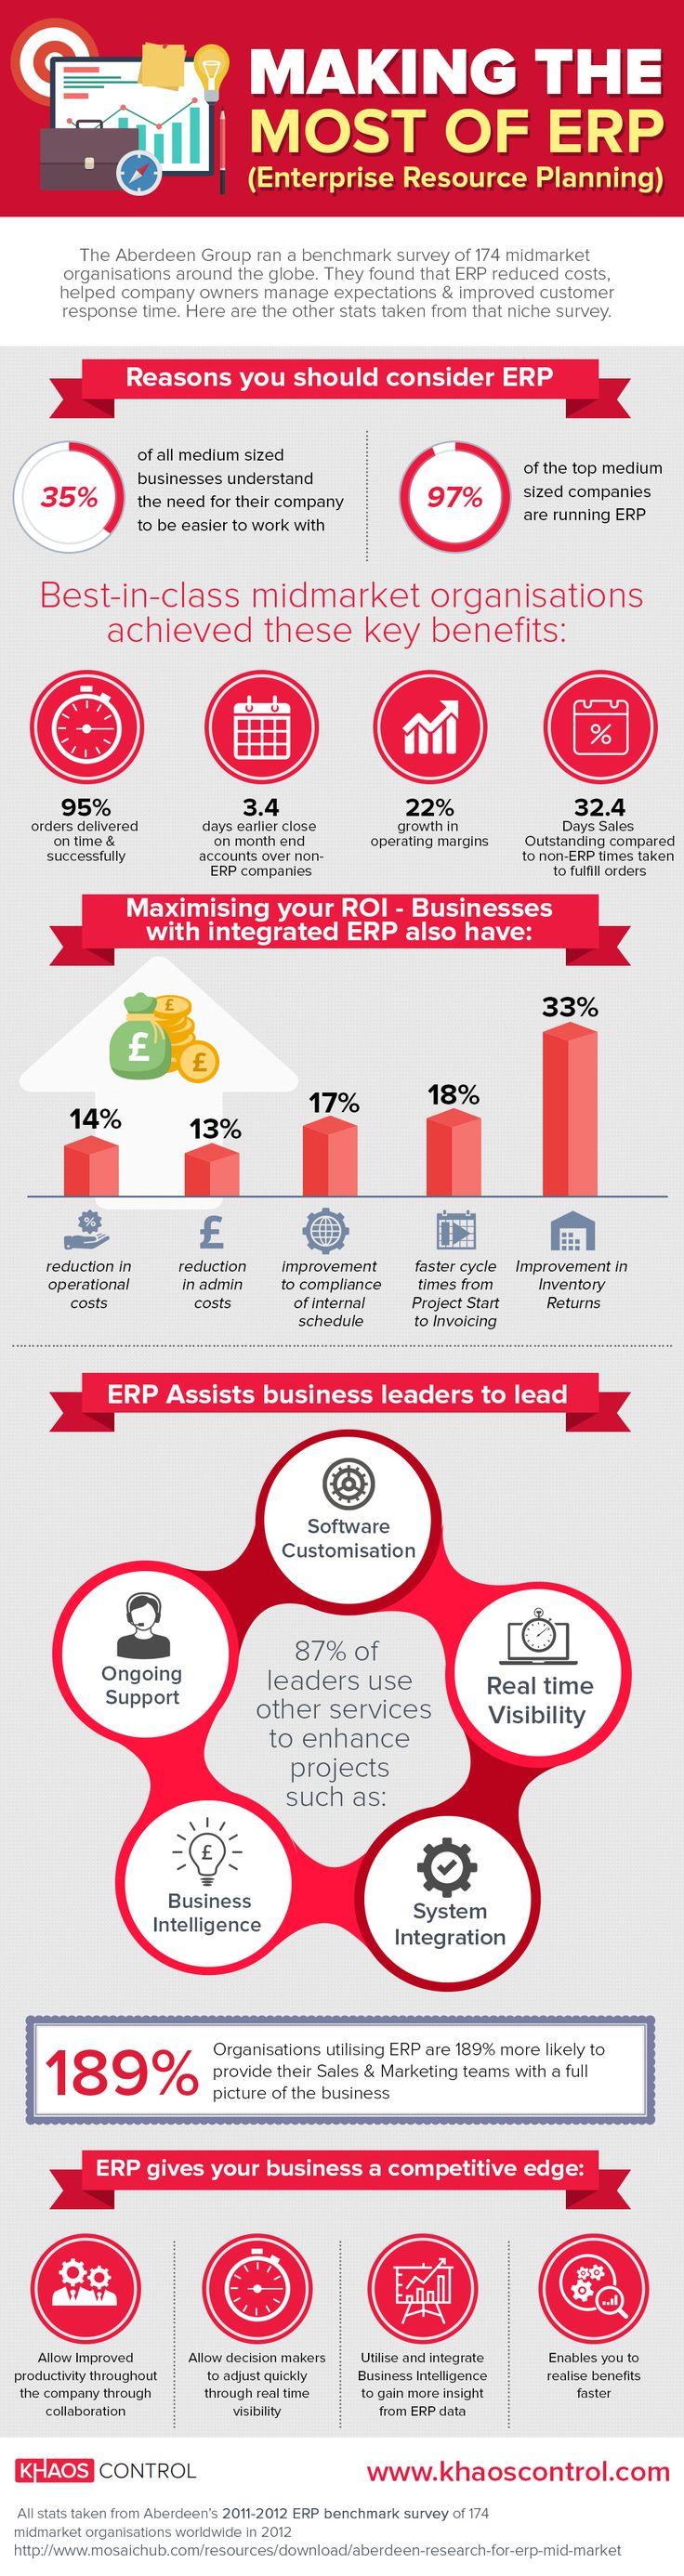 Profitable Business Ideas 2015 In Kenya